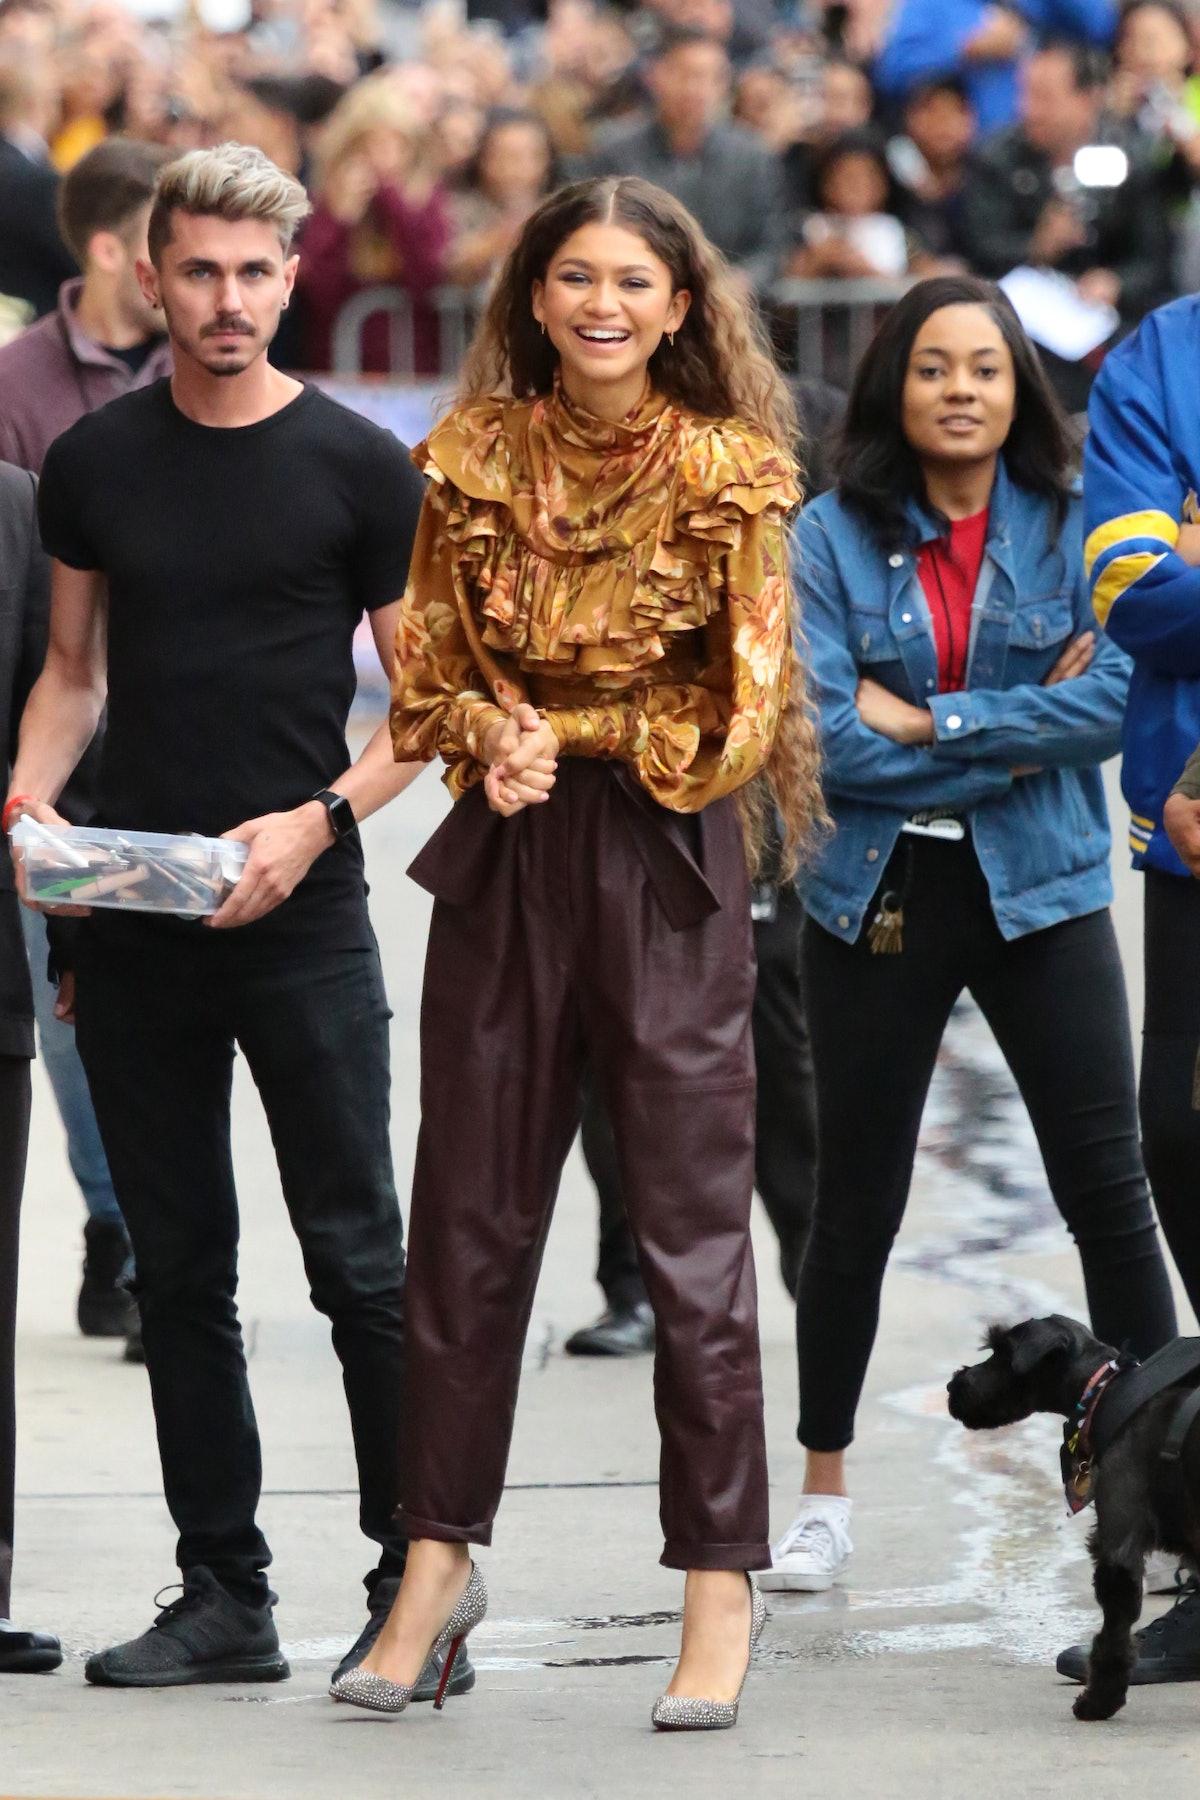 Celebrity Sightings in Los Angeles - May 9, 2019